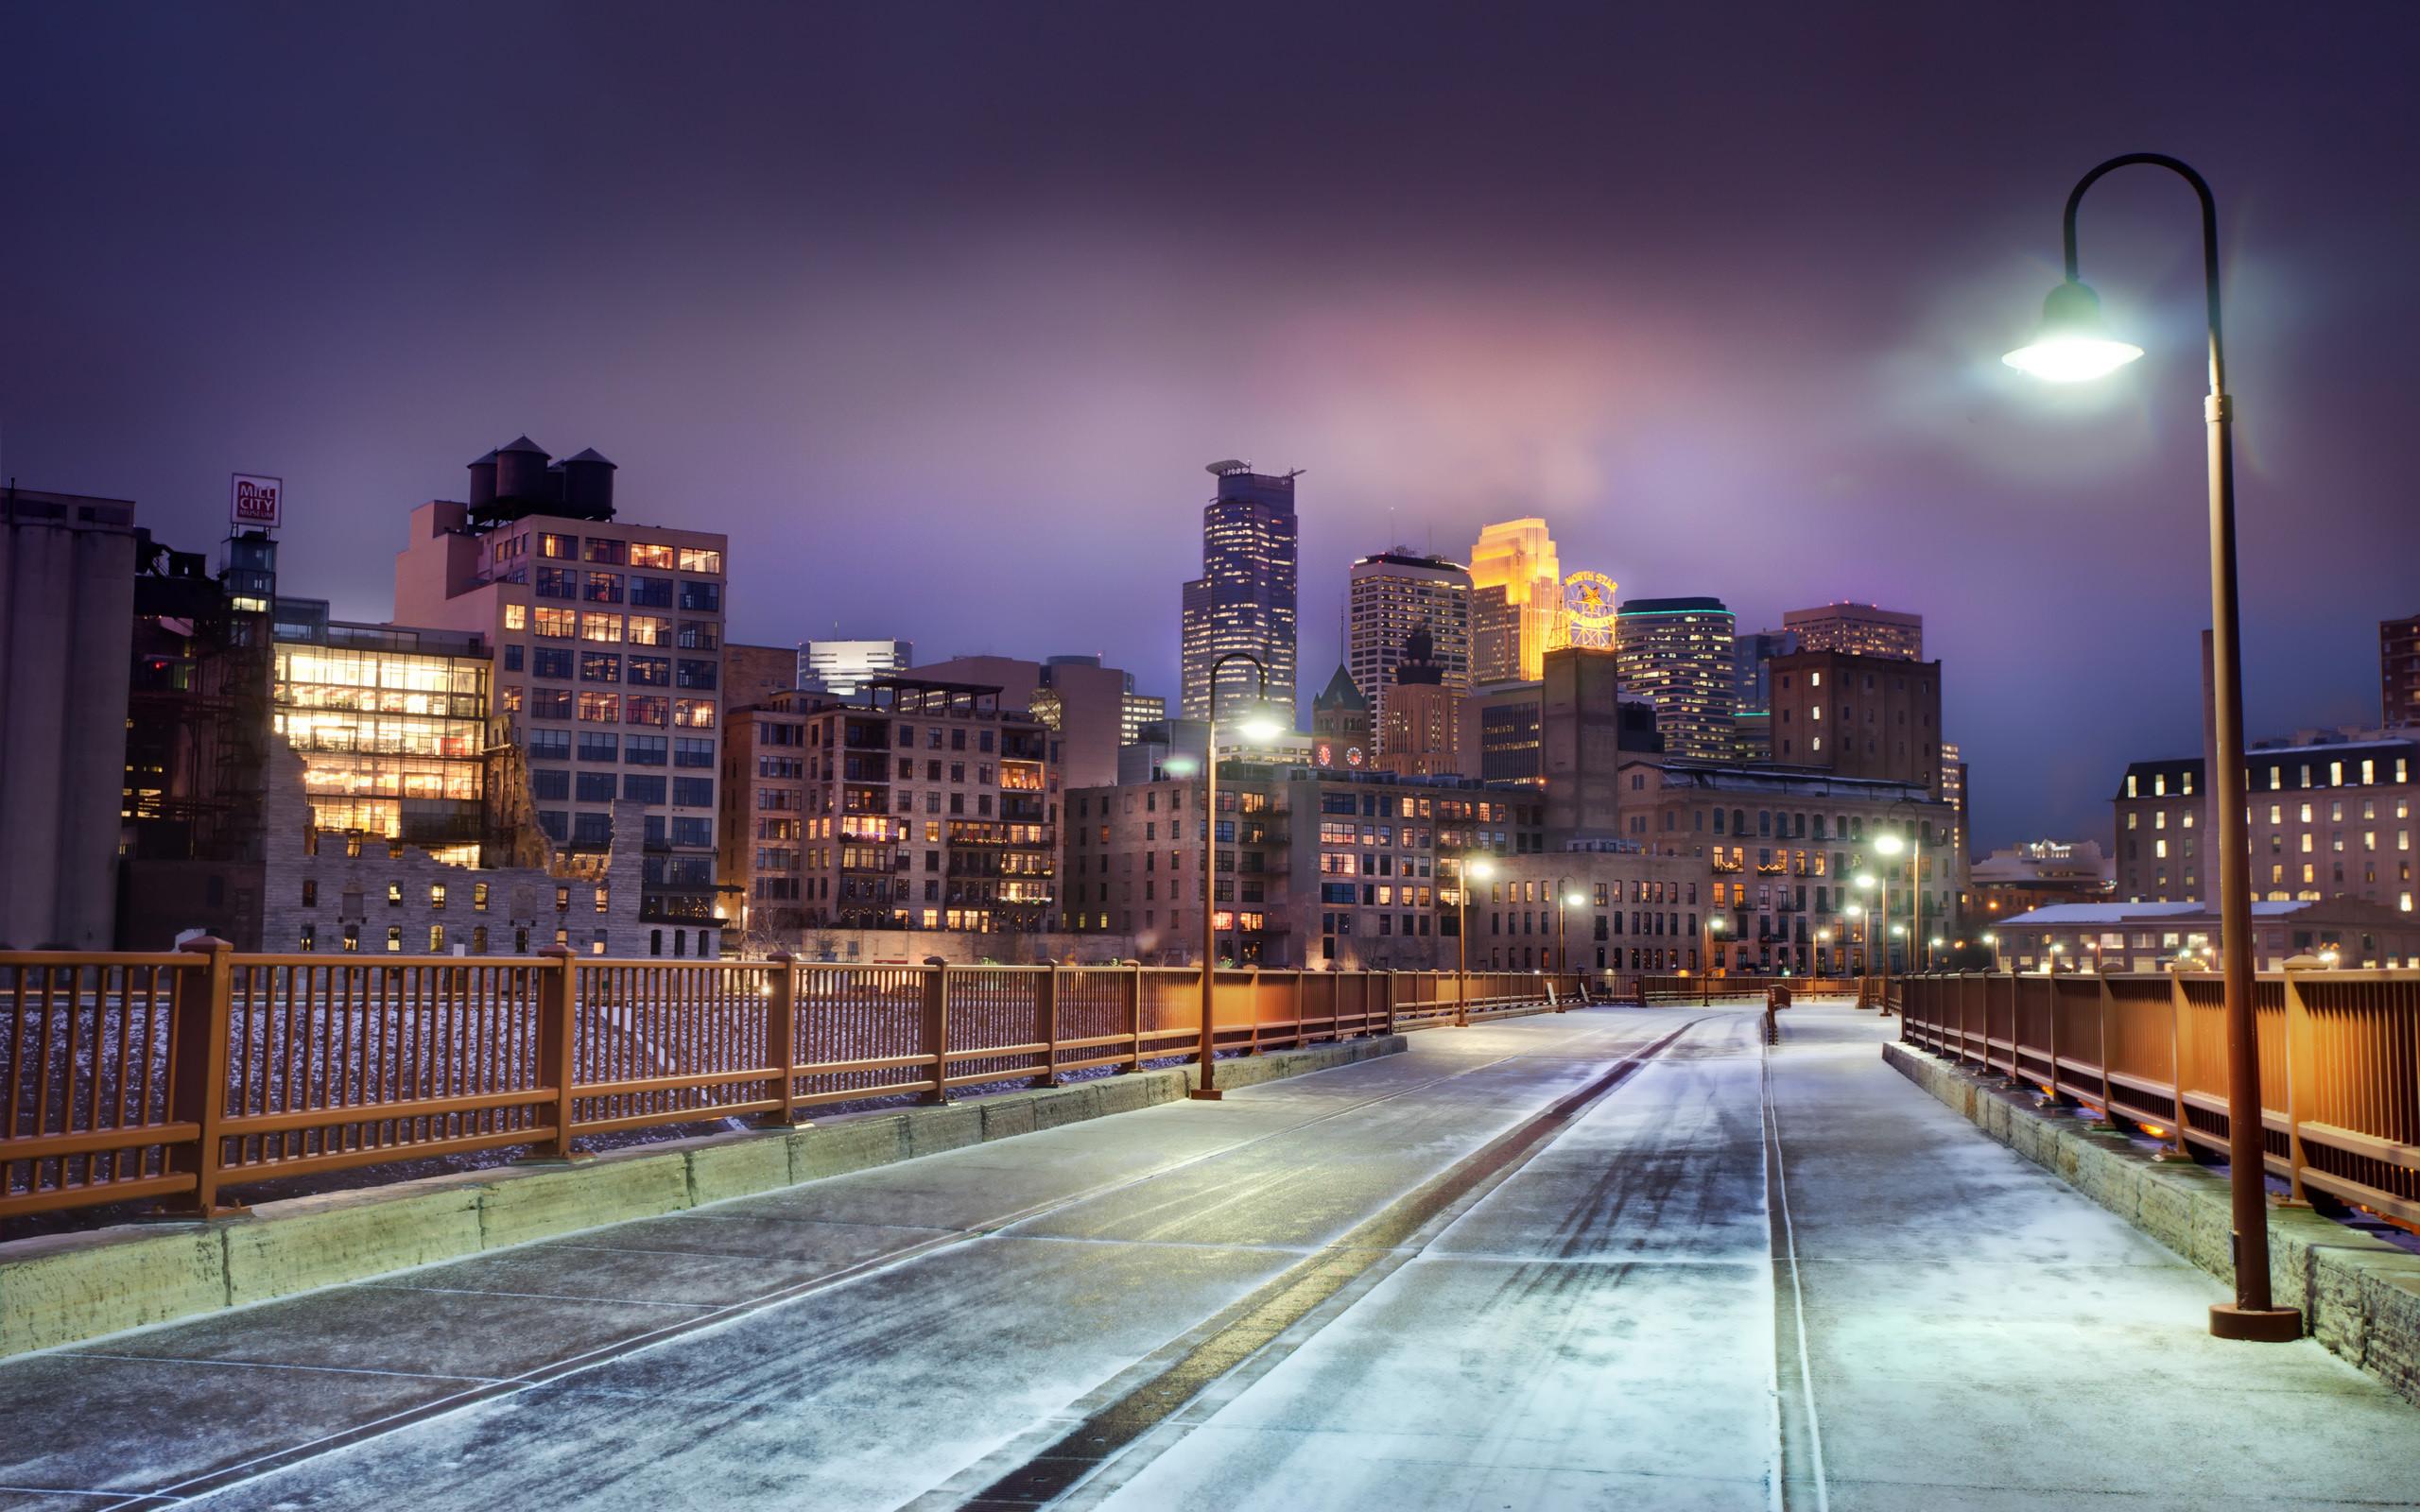 Winter City Wallpaper Background 3328